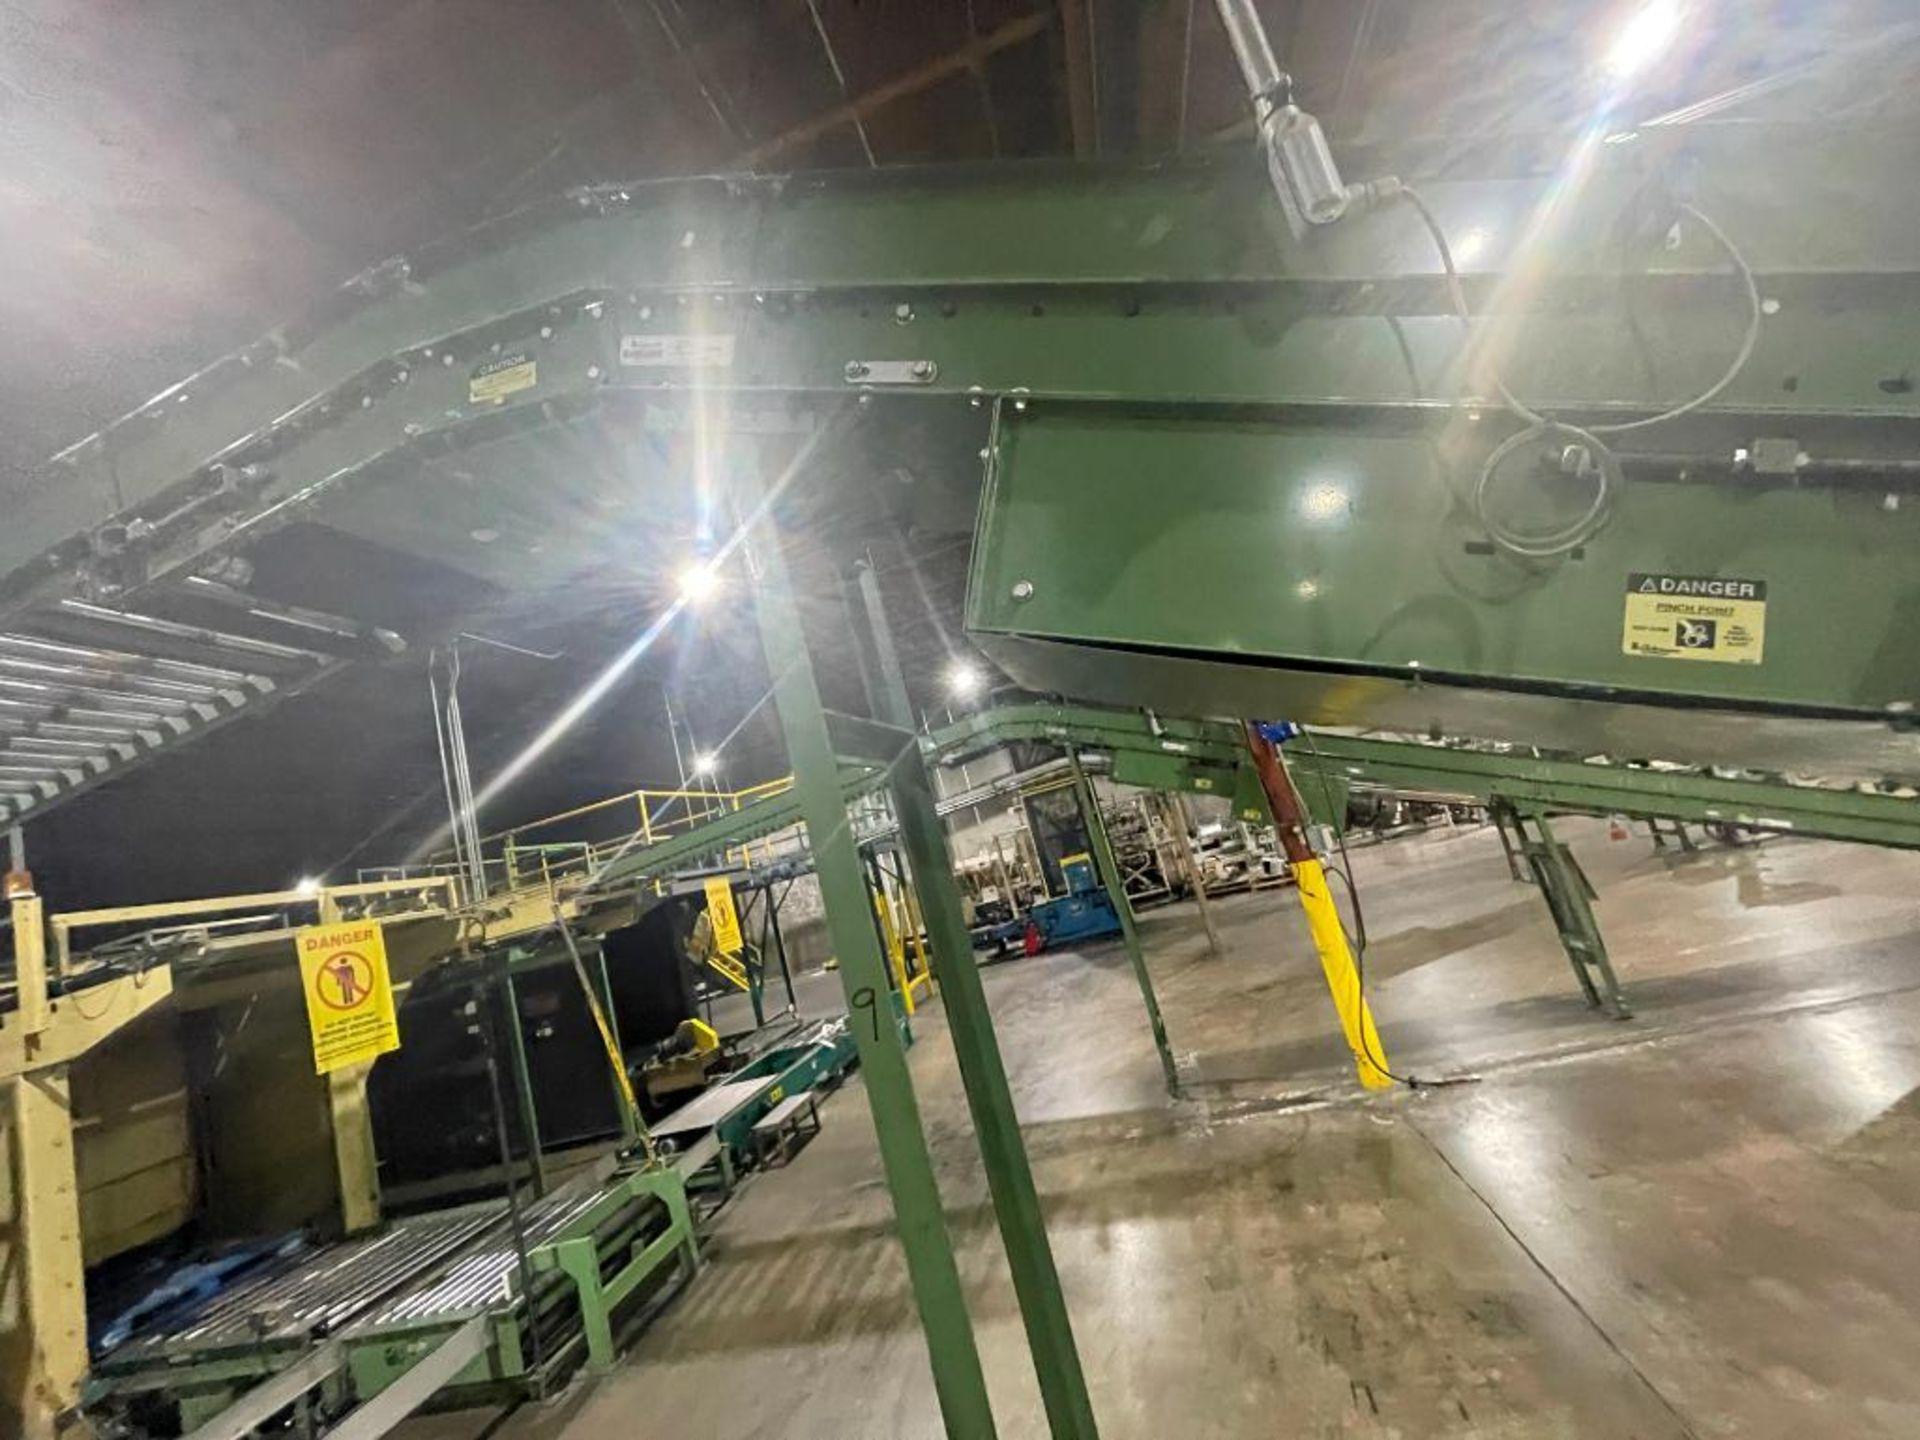 mild steel incline conveyor - Image 4 of 5